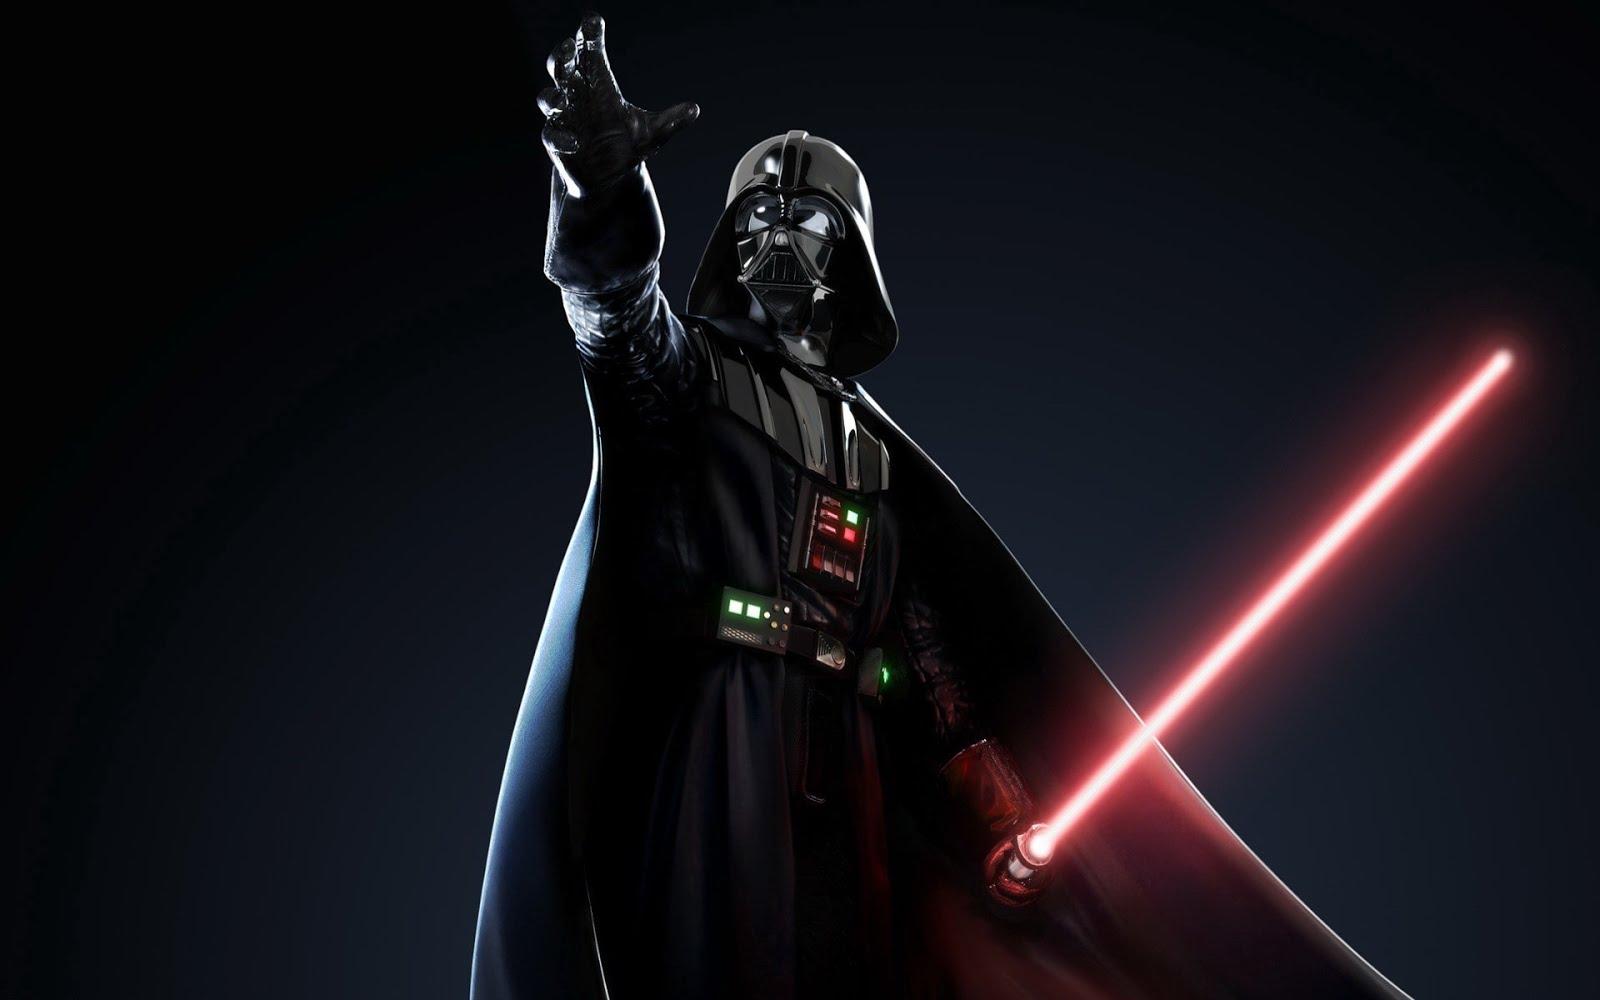 Star Wars Cartoon Wallpaper Cartoon Images 1600x1000